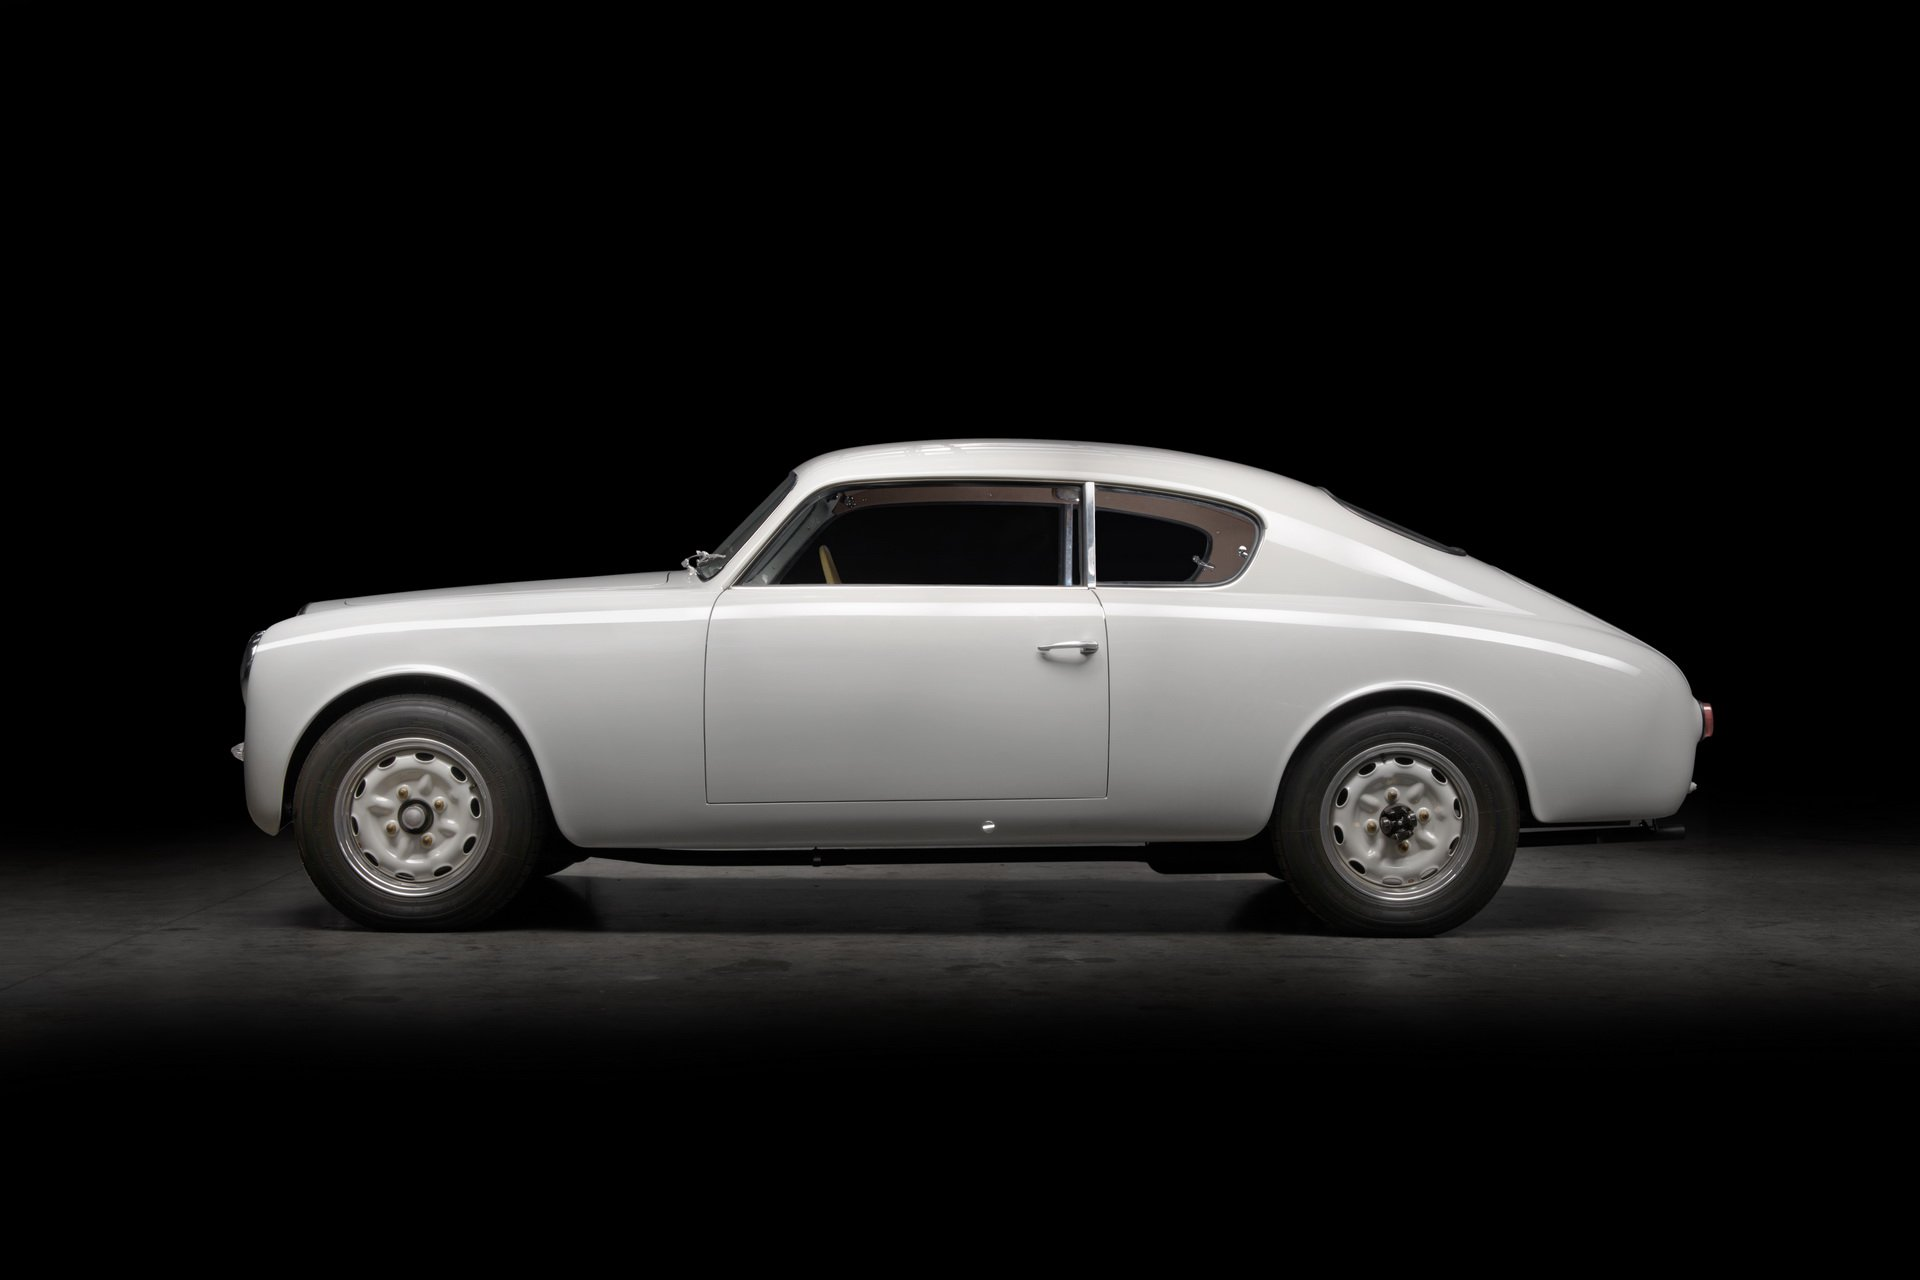 Lancia-Aurelia-B20-GT-restored-8